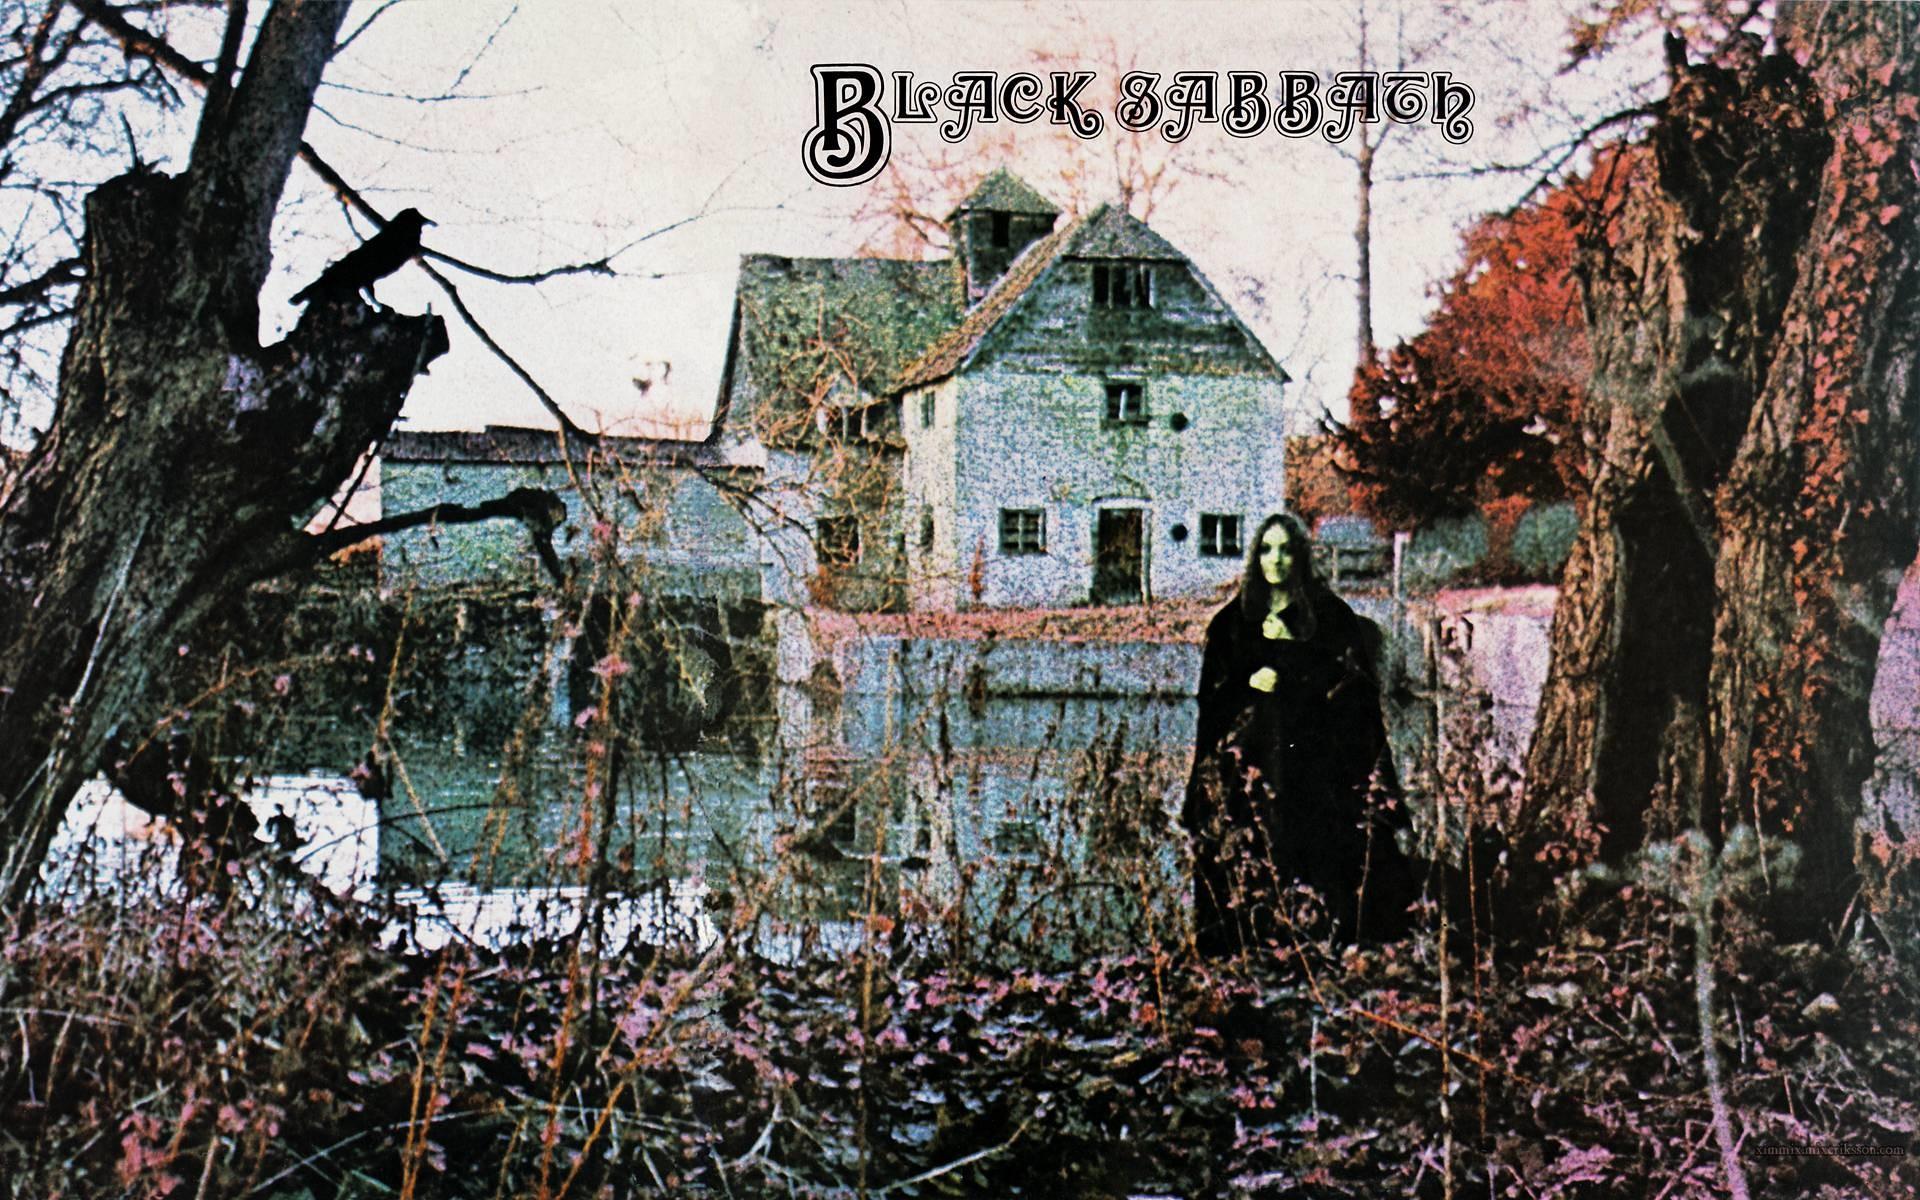 30 Black Sabbath Wallpapers | Black Sabbath Backgrounds